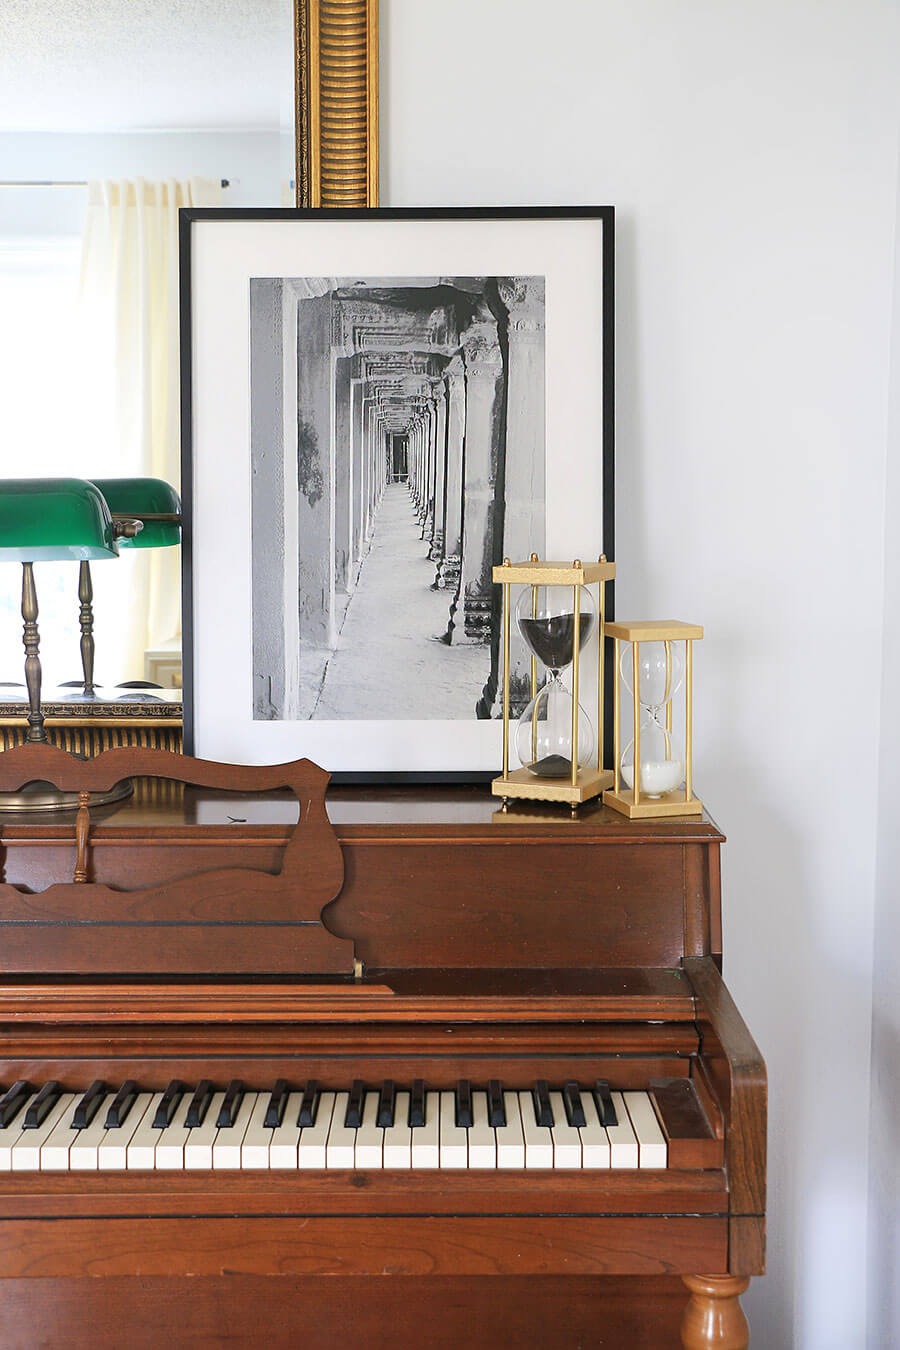 Framed-Art-on-Piano